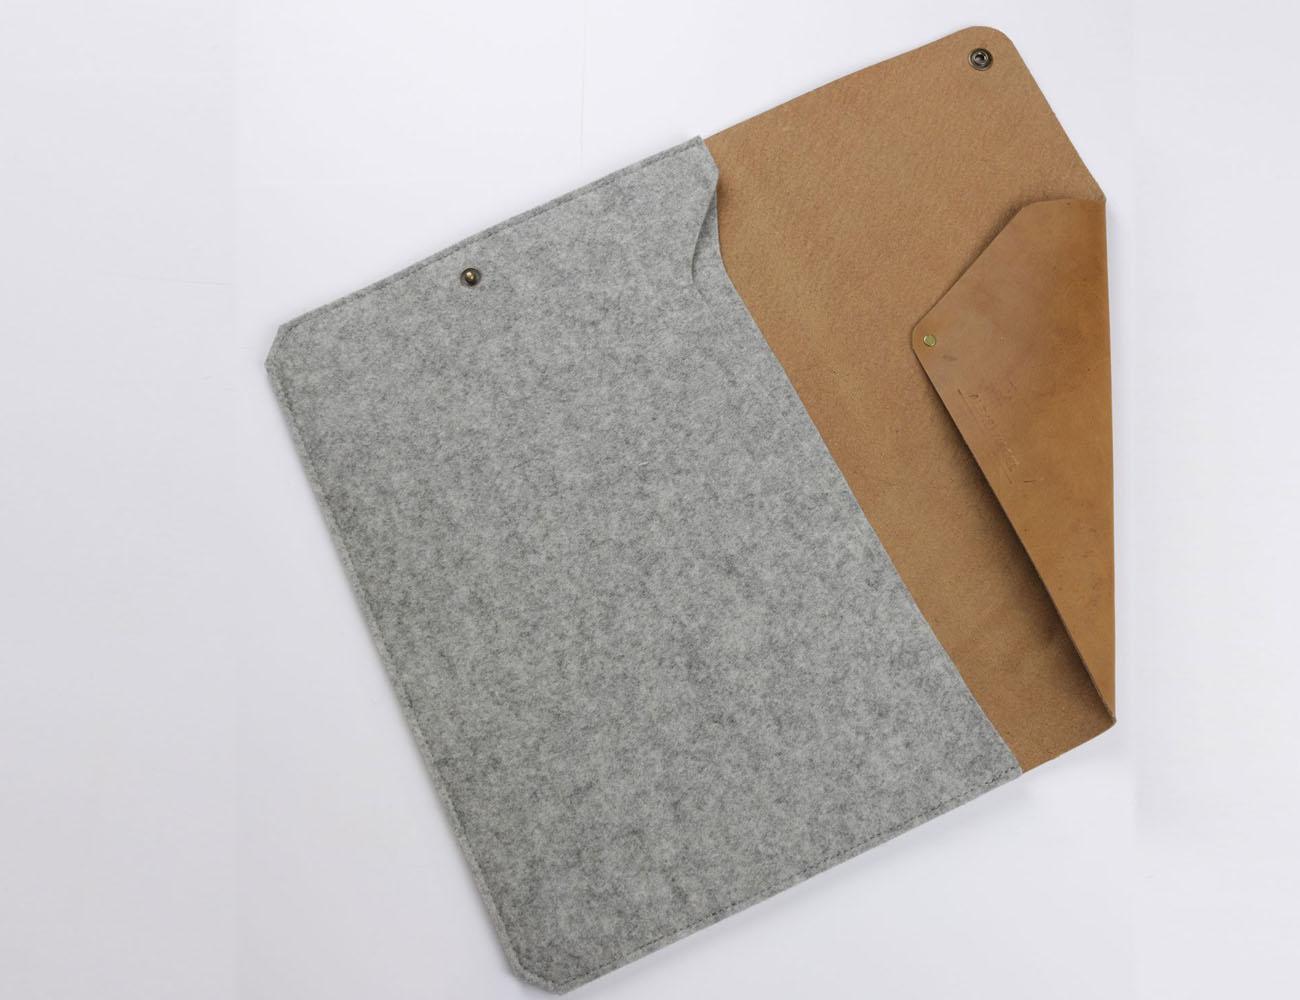 Leather & Felt MacBook Air Sleeve by Alexej Nagel